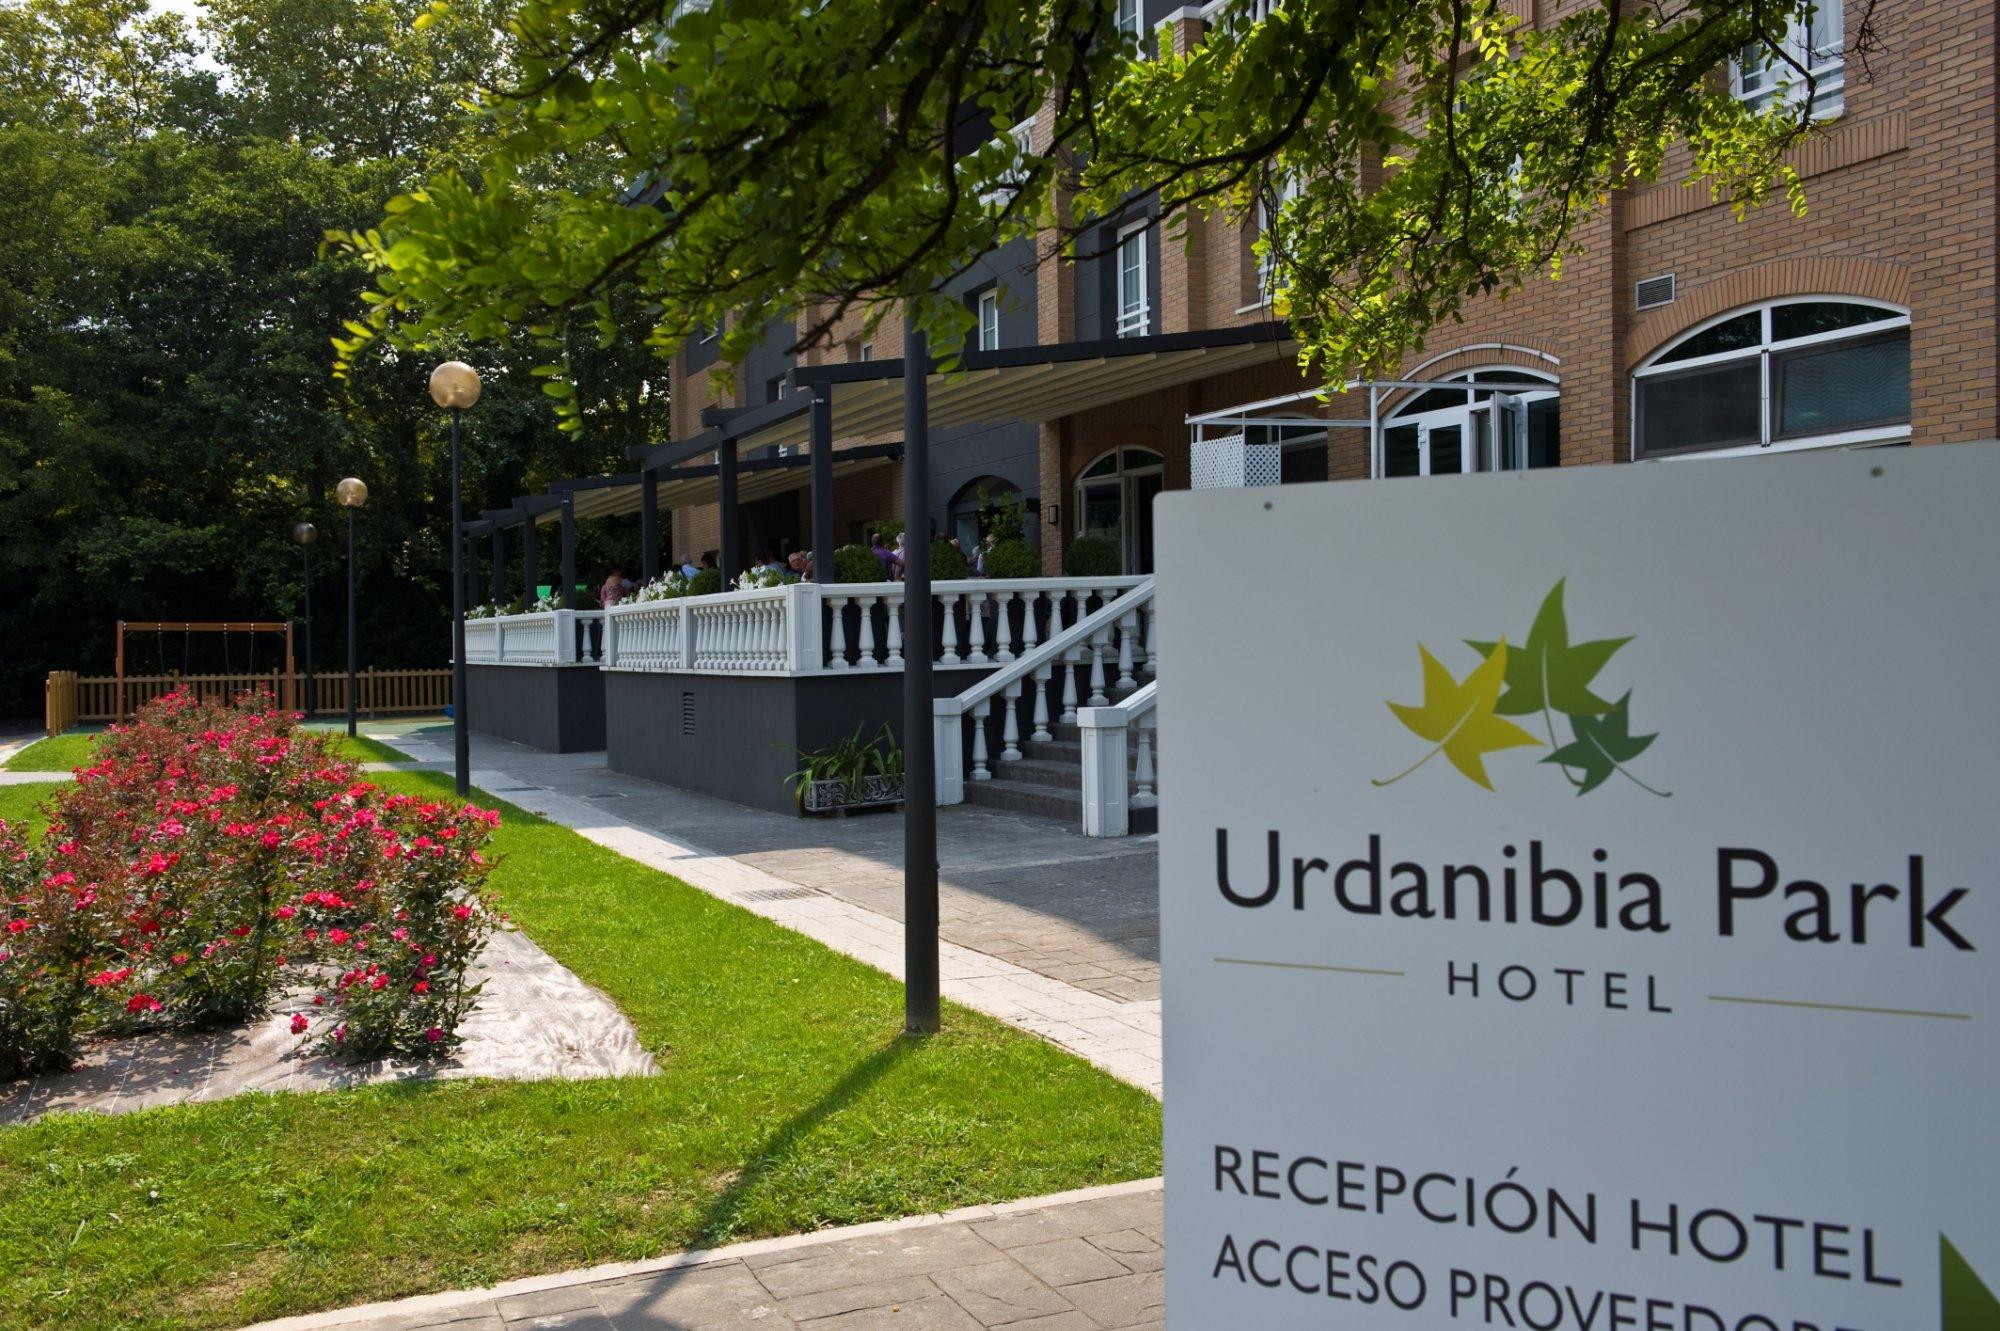 Urdanibia Park Hotel